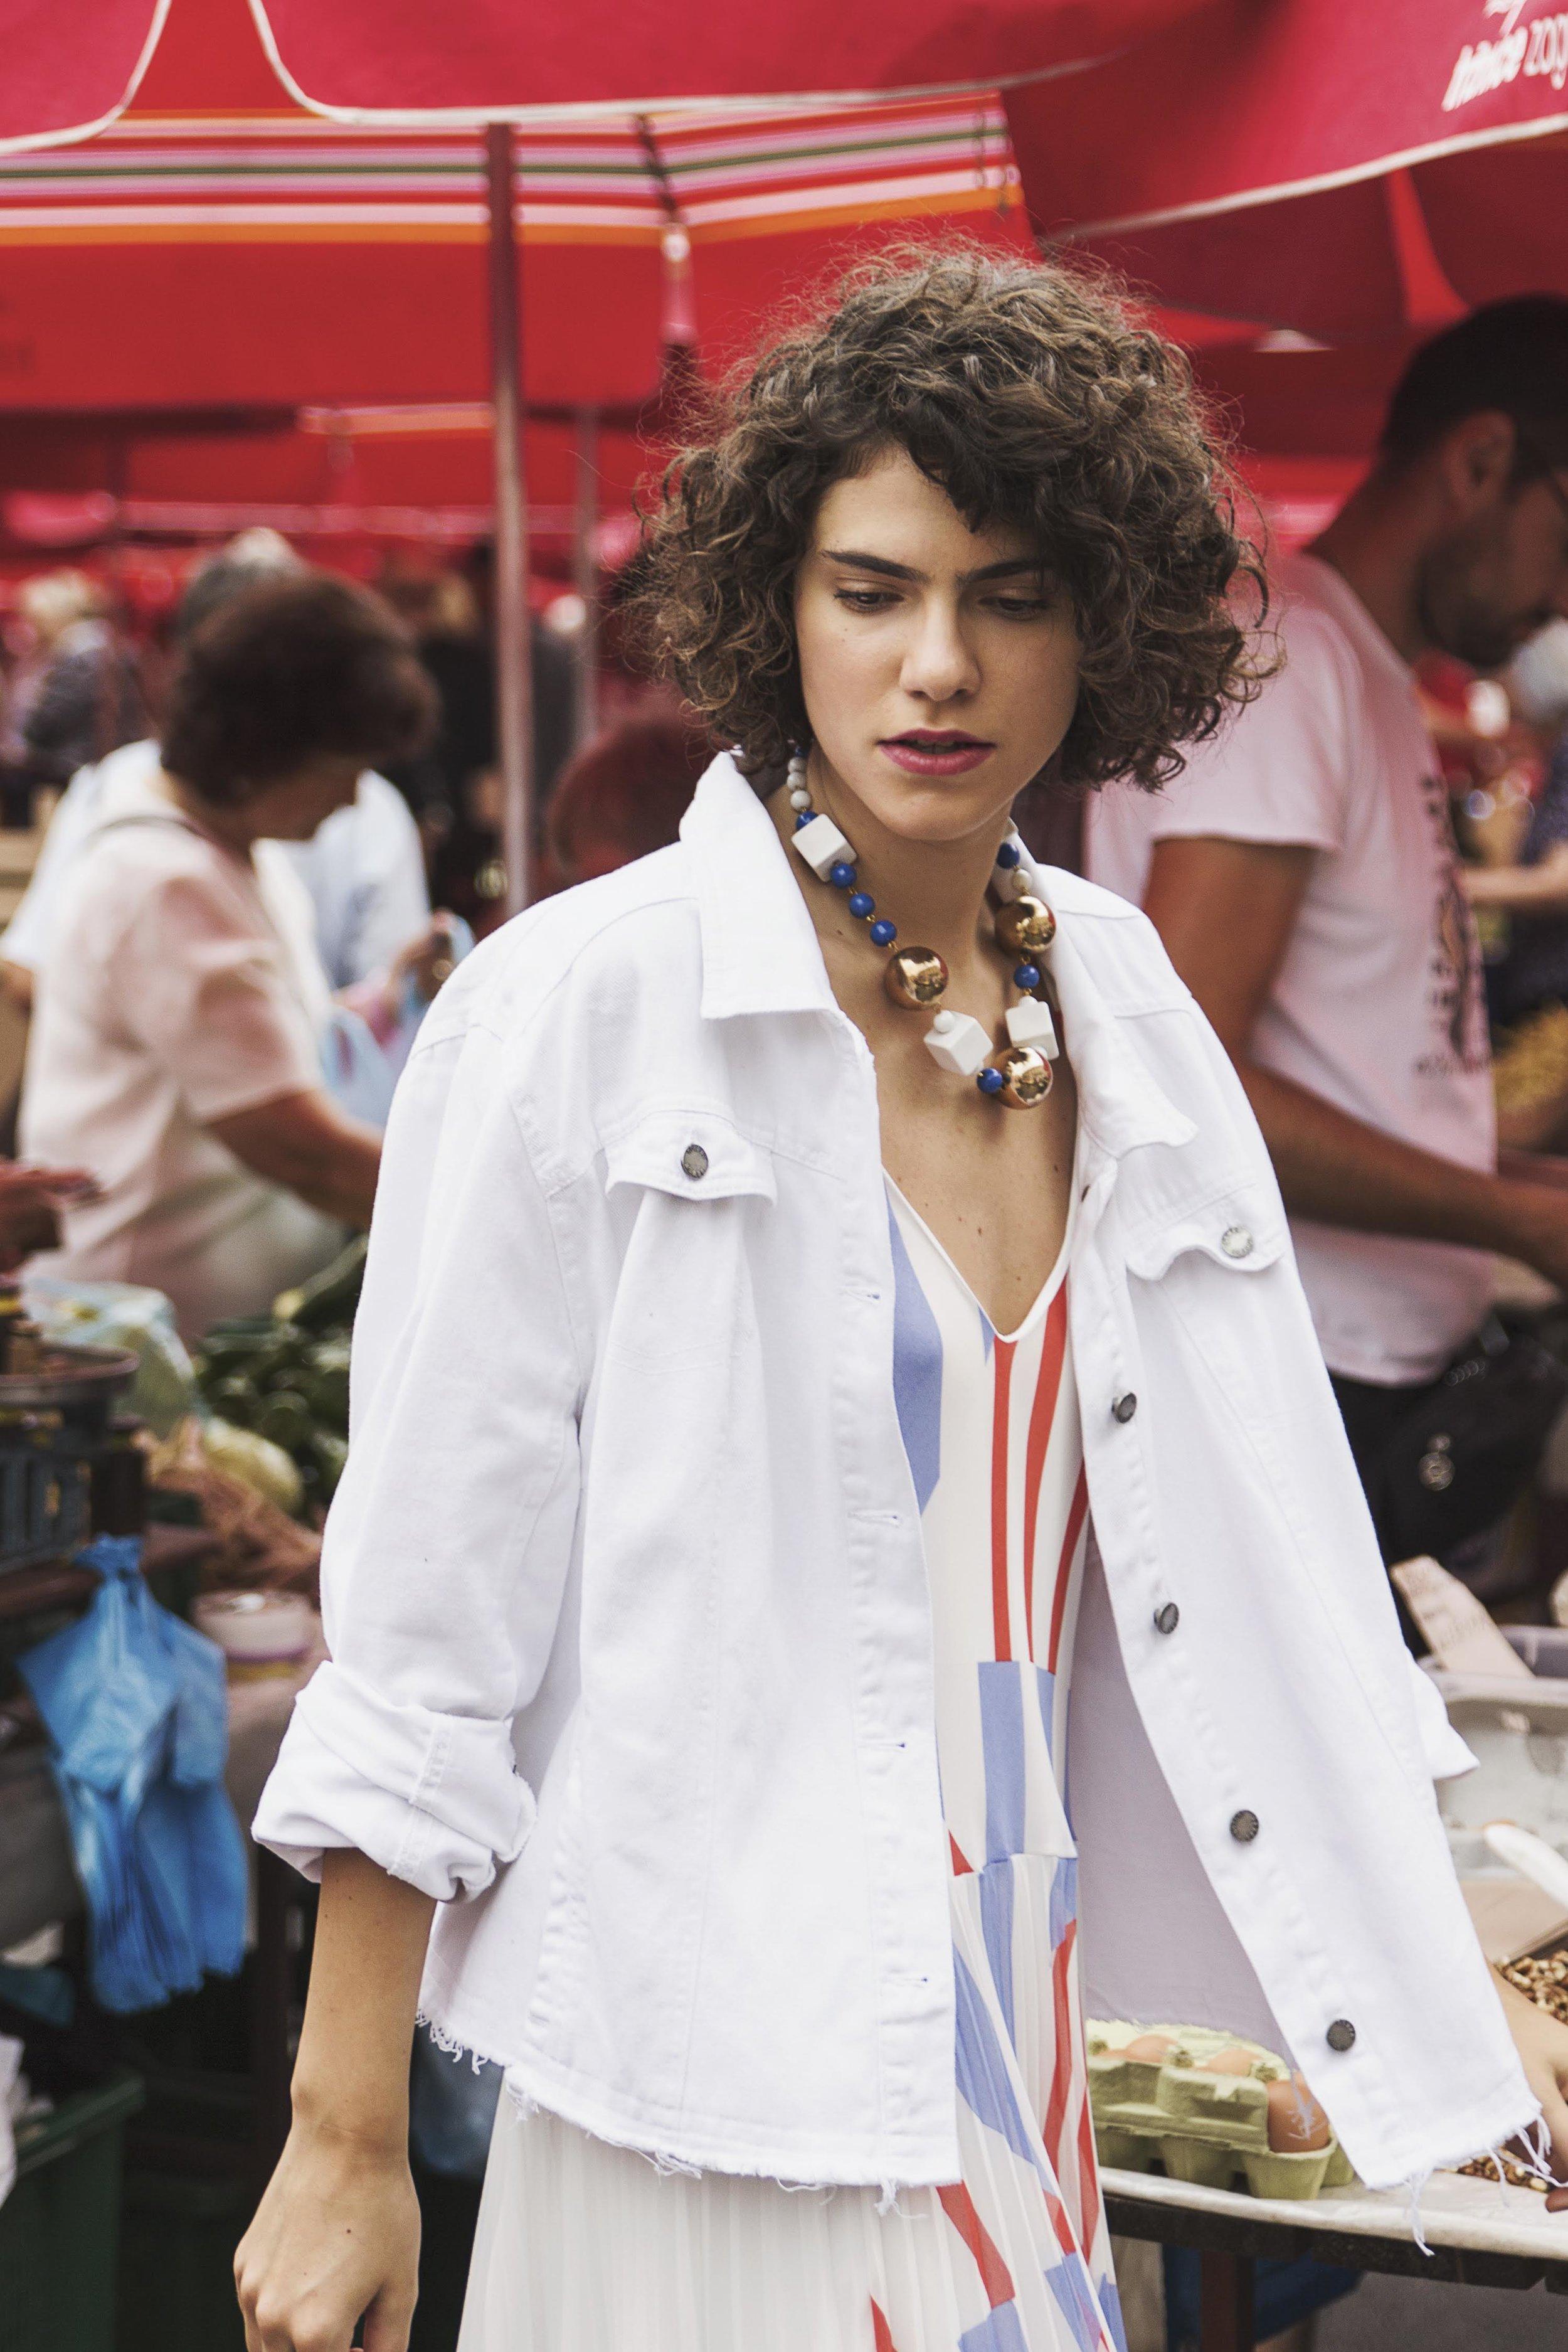 luka-lajic-fashion-photography-robert-sever-dizajner-croatian (14).jpg